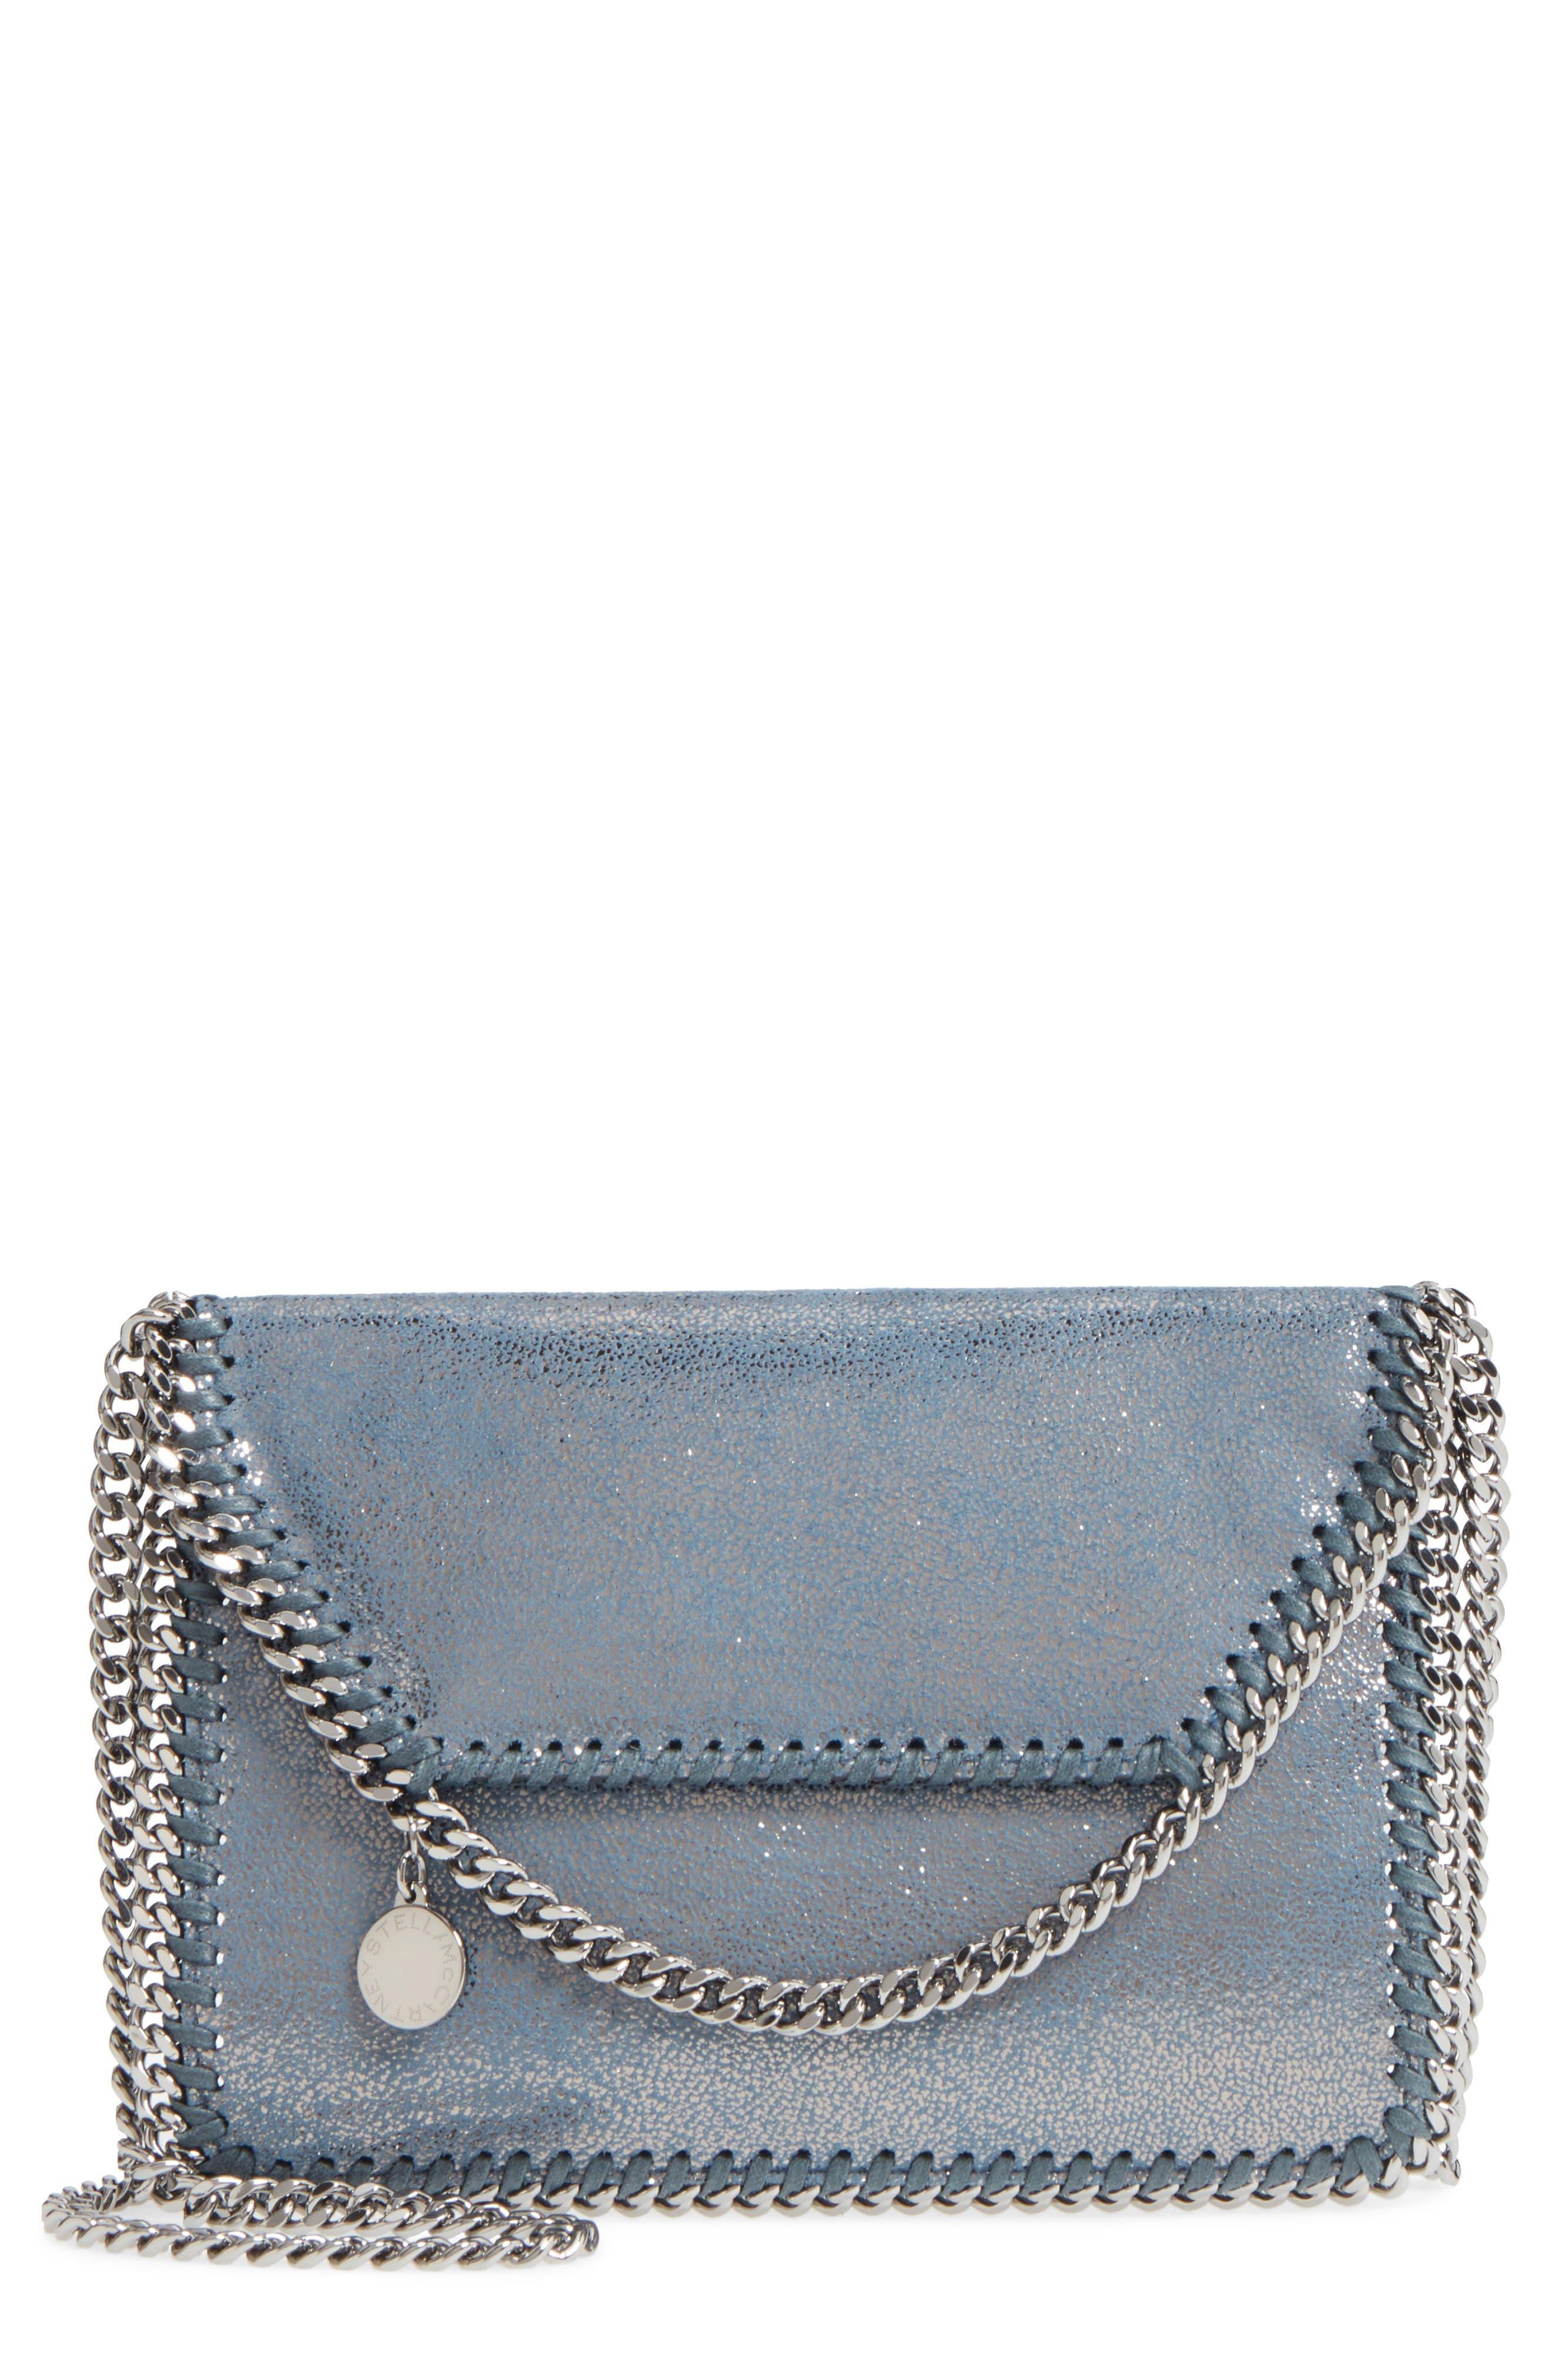 Alternate Image 1 Selected - Stella McCartney Metallic Faux Leather Crossbody Bag